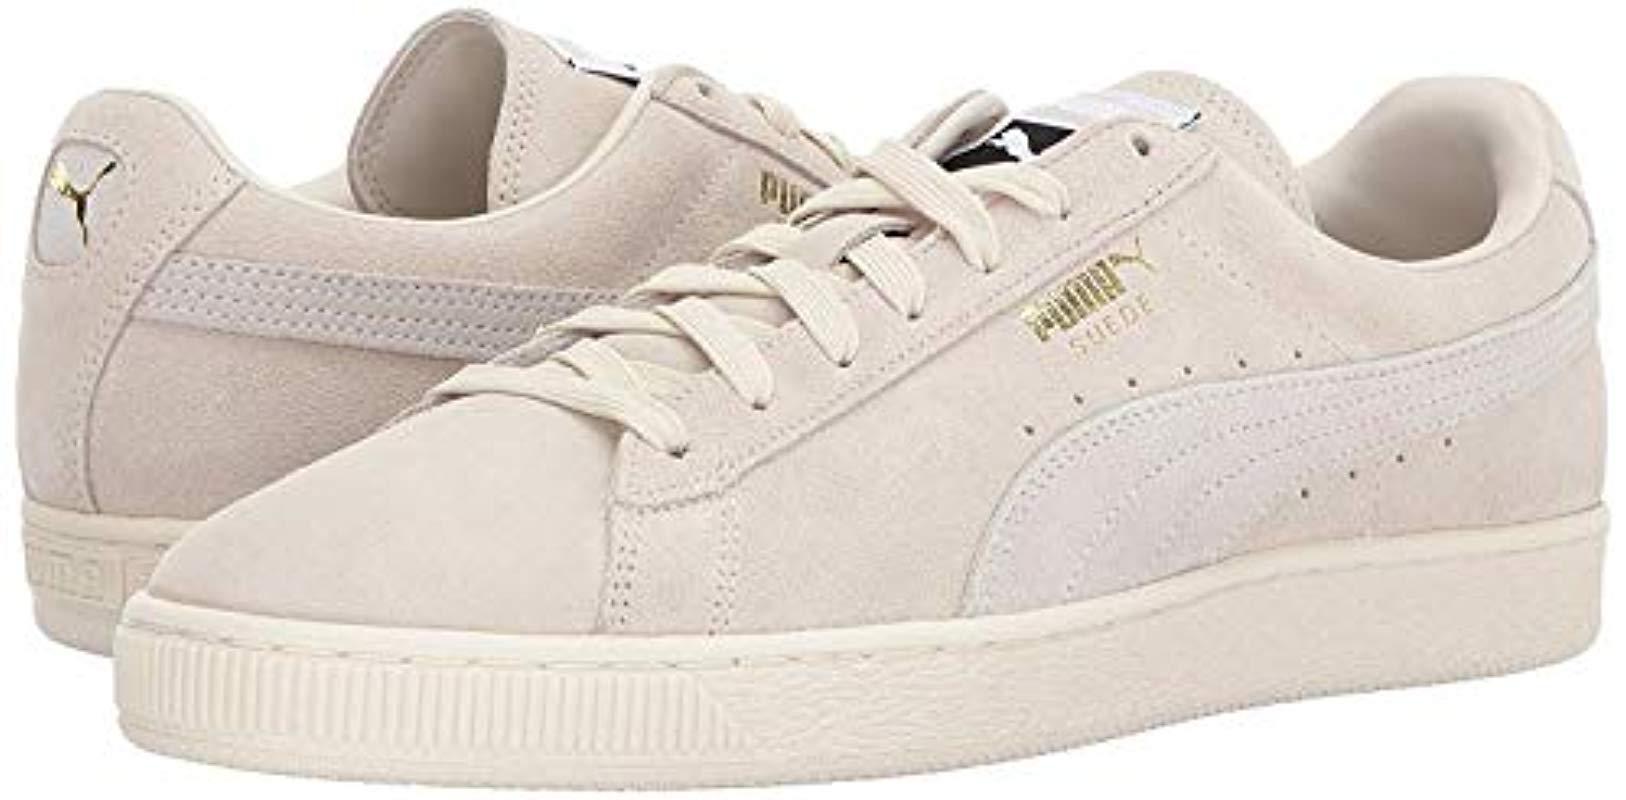 e36abd96b70c Lyst - PUMA Adult Suede Classic Shoe in White for Men